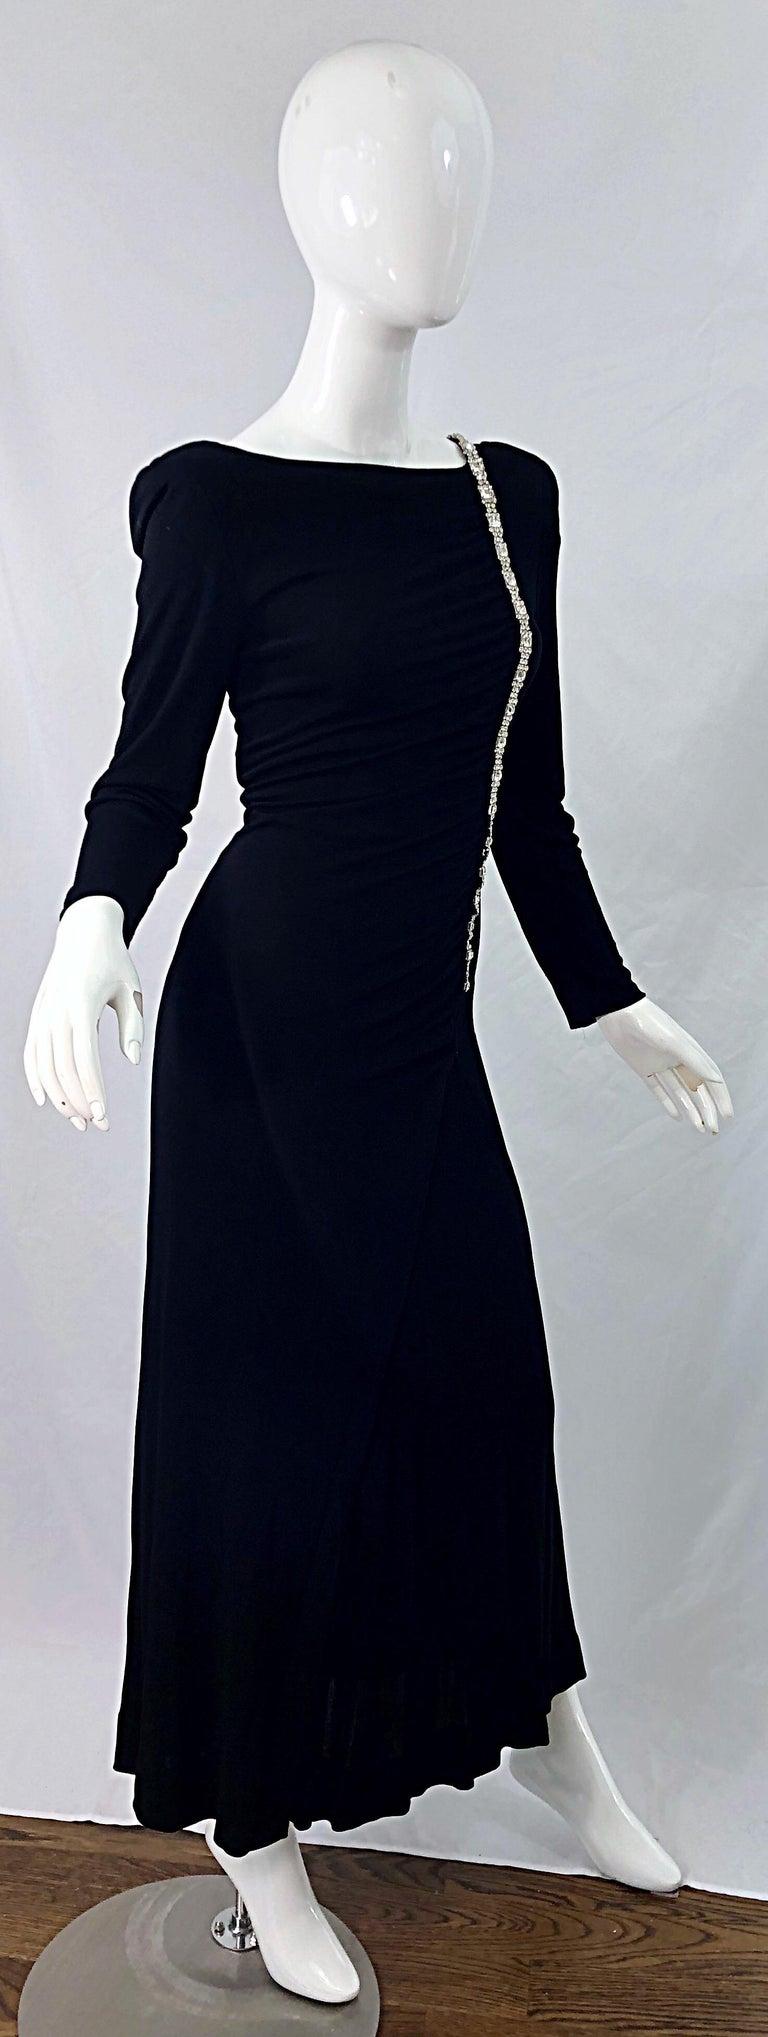 1980s Travilla Size 10 Black Matte Silk Jersey Rhinestone Vintage 80s Gown Dress For Sale 6